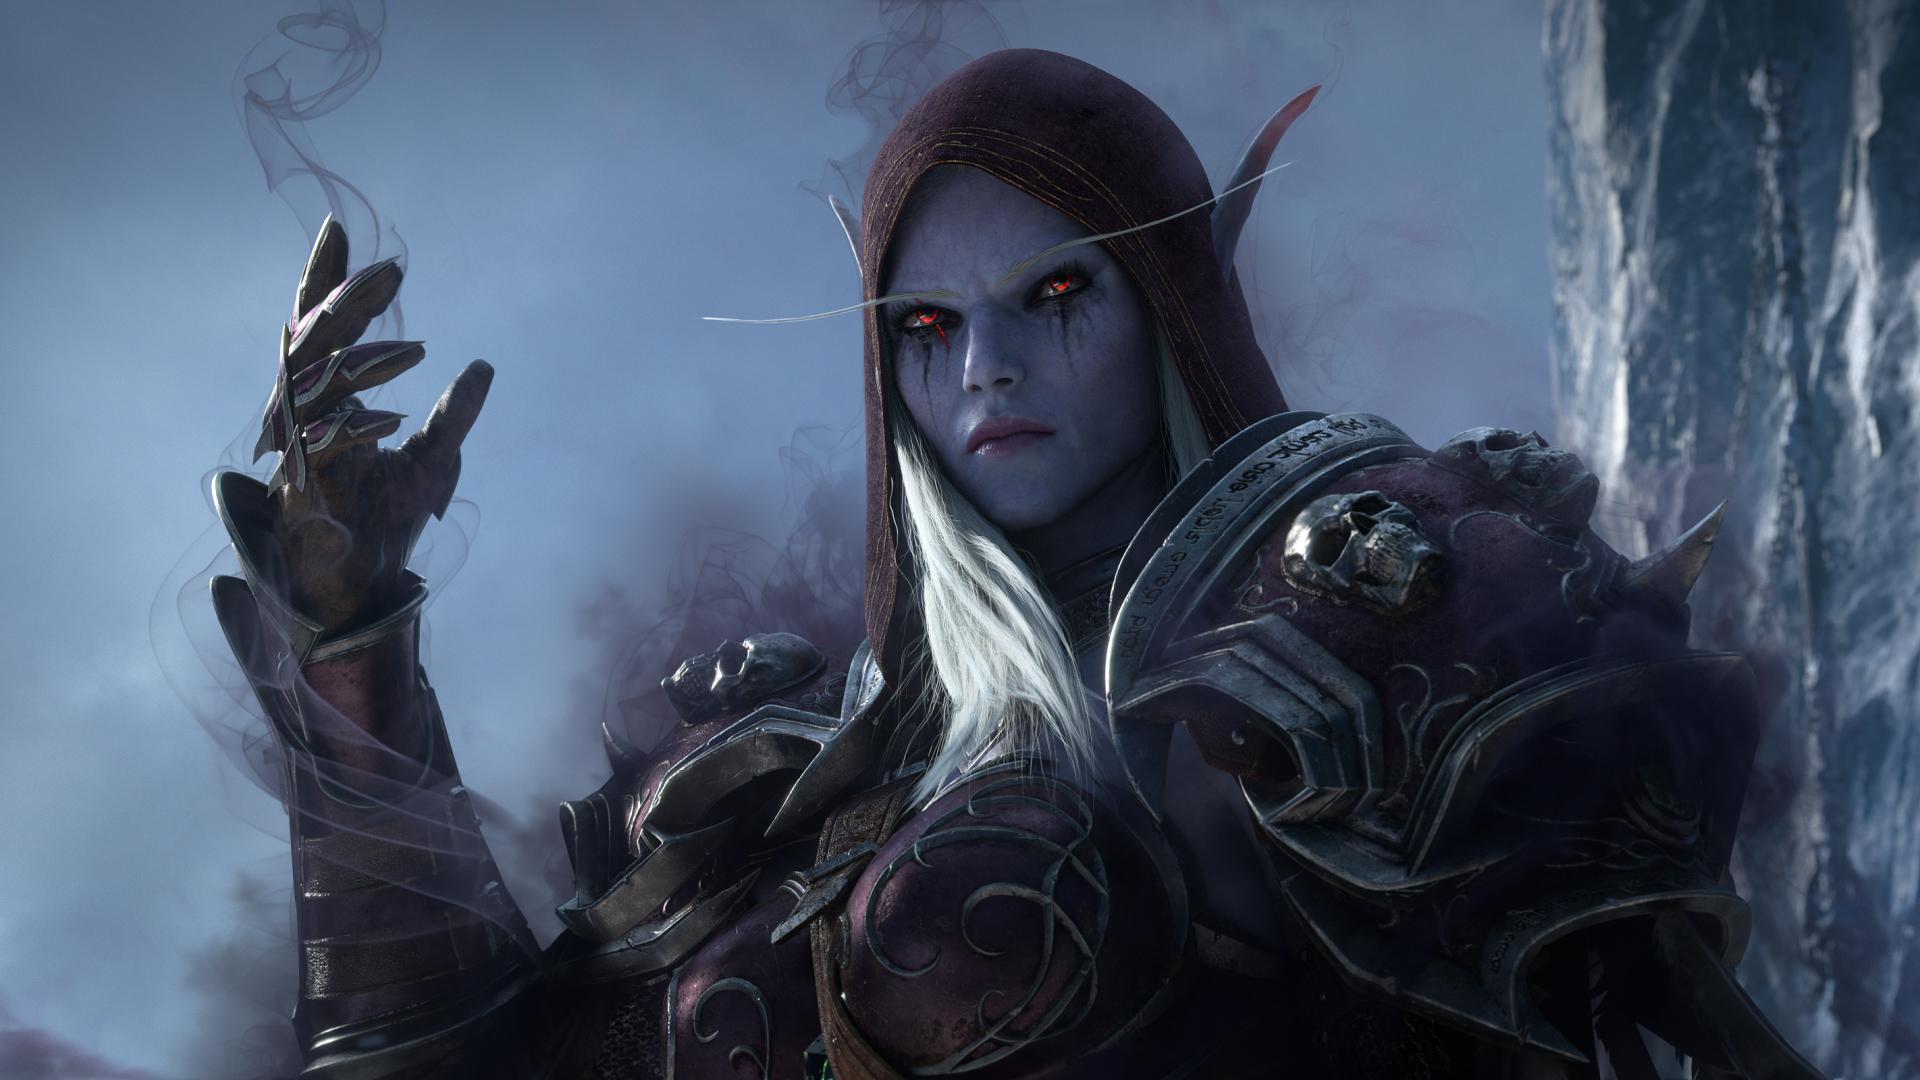 General 1920x1080 World of Warcraft: Shadowlands Sylvanas Windrunner elven pointy ears red eyes women white hair hoods World of Warcraft Warcraft video games